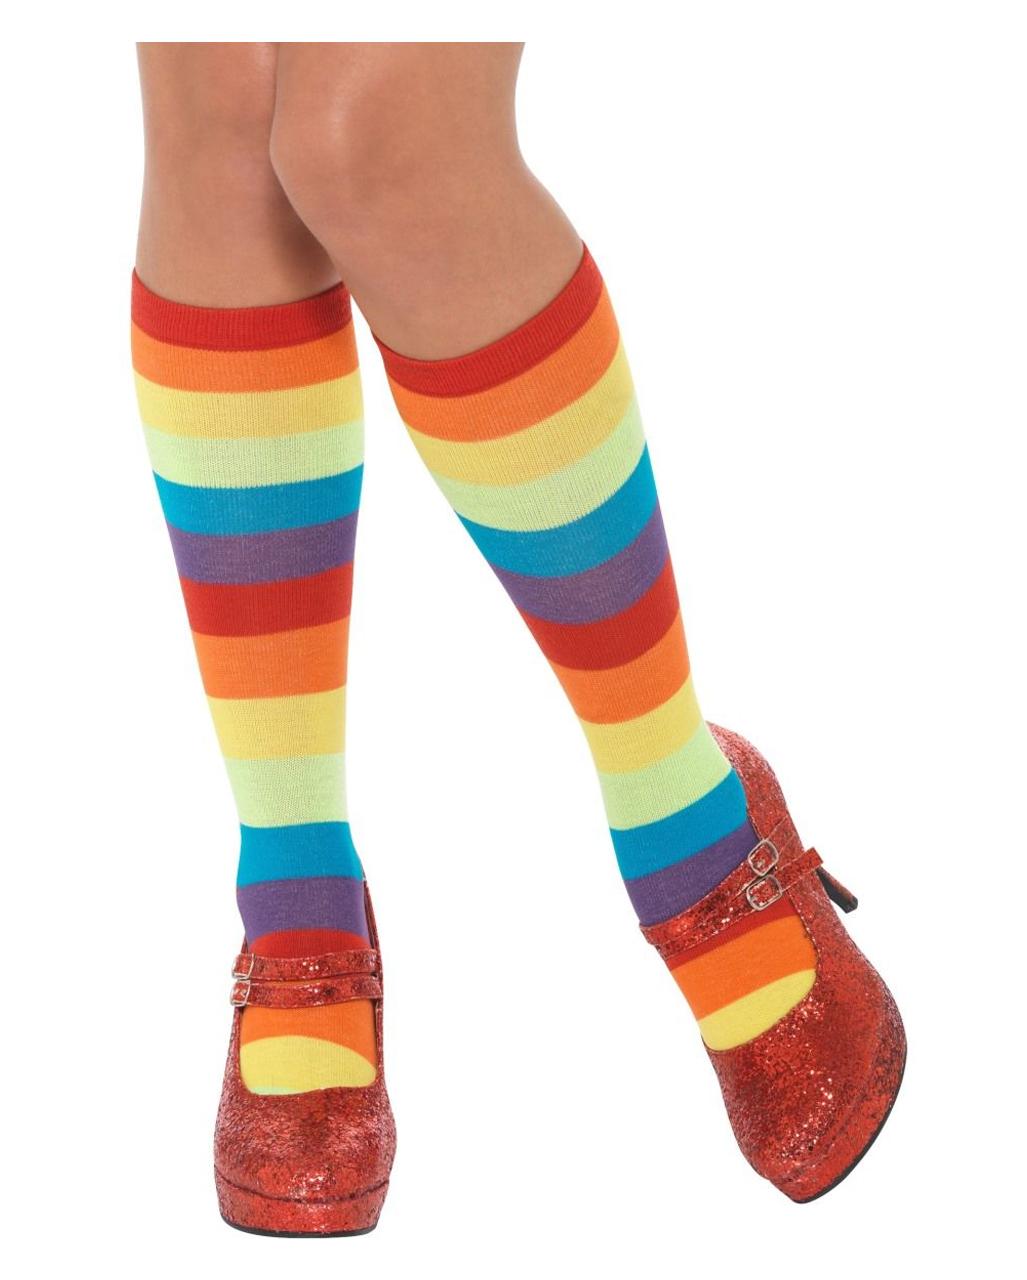 sc 1 st  Horror-Shop.com & Rainbow Clown Socks Unisex Clown costume accessories | horror-shop.com